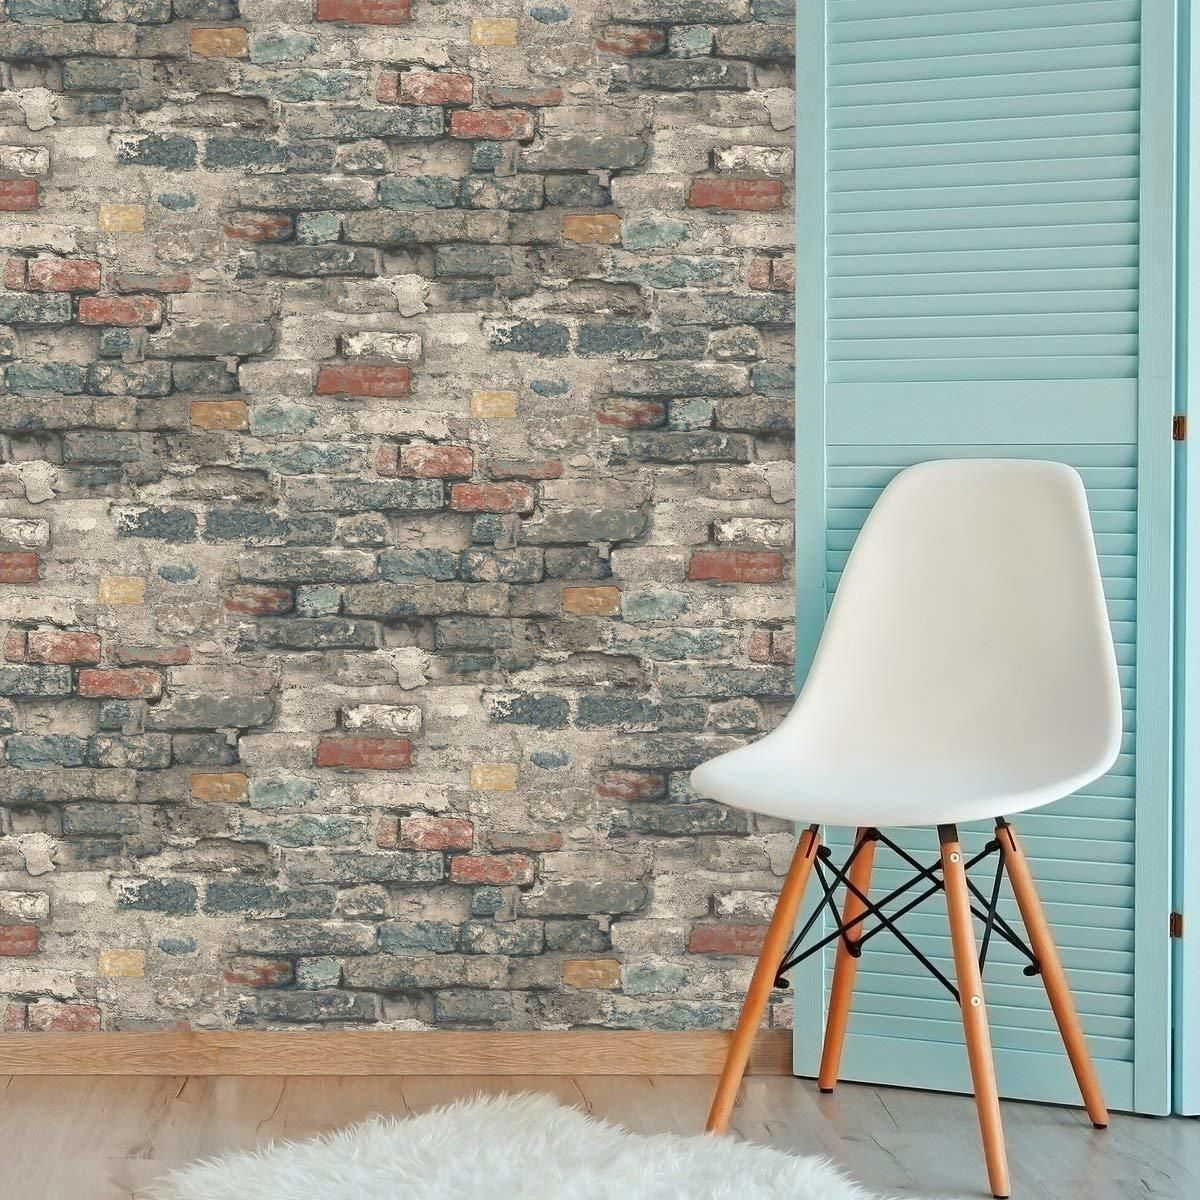 Roommates Rmk11080wp Brick Alley Peel Stick Wallpaper Teal Duvar